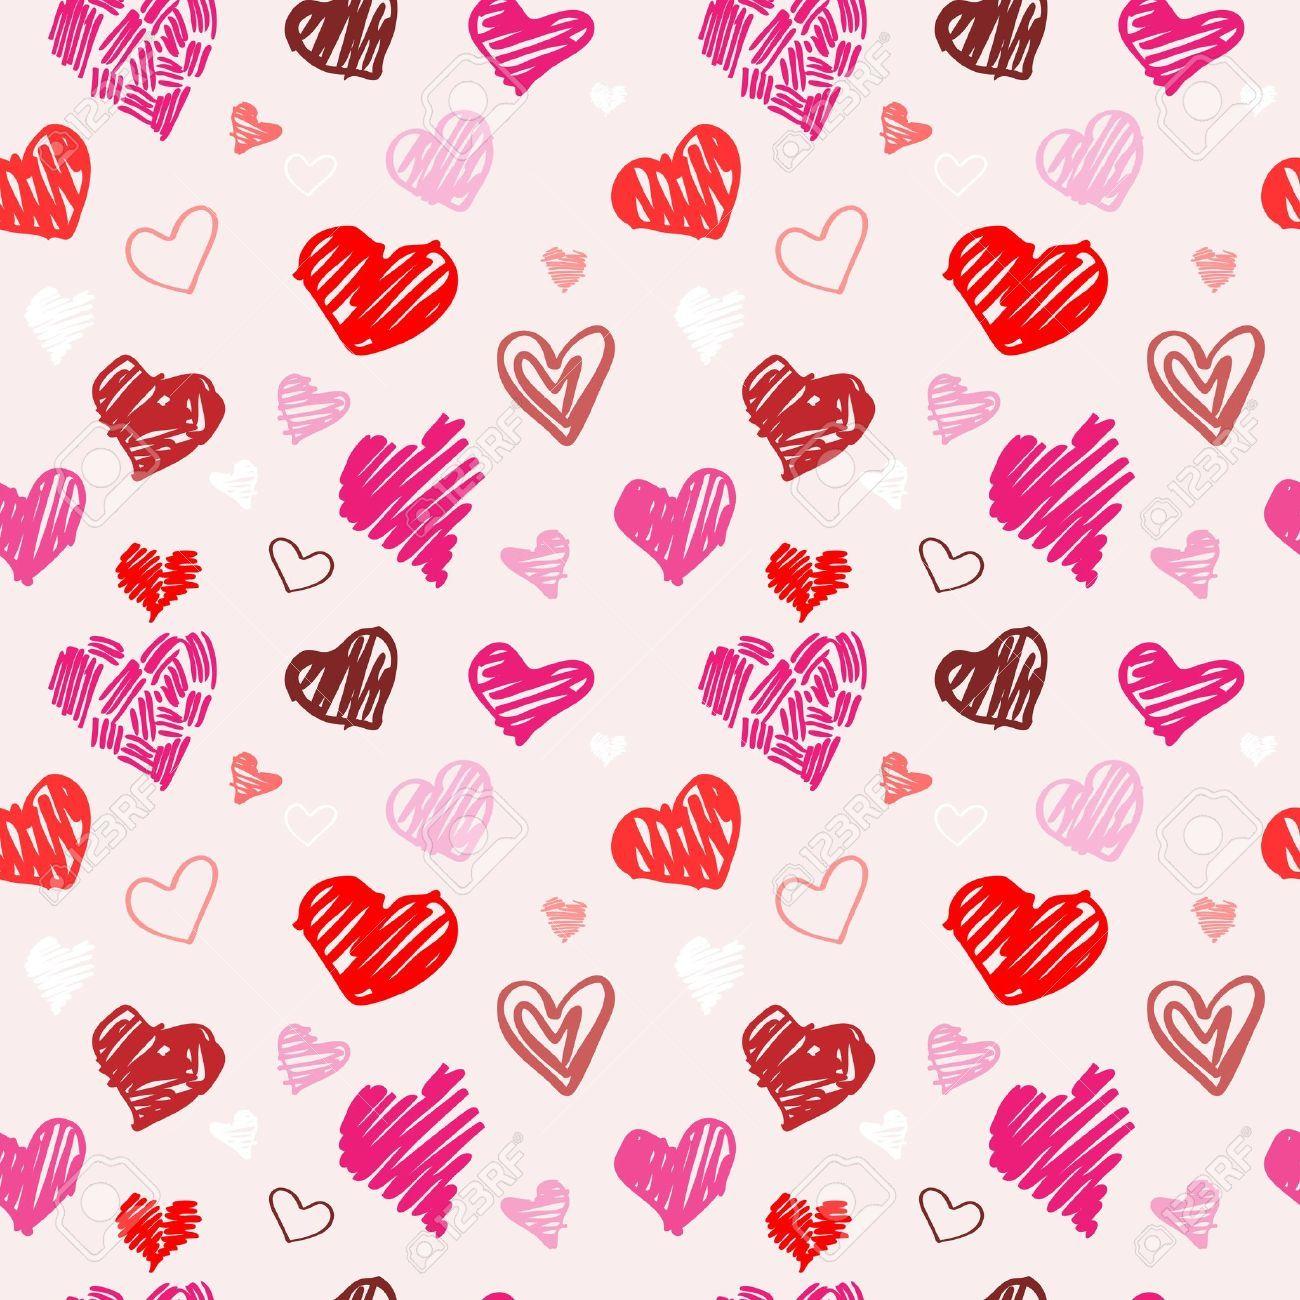 Love ℗ Pattern Library | Mafe | Pinterest | Textura, Fondos y Rosas